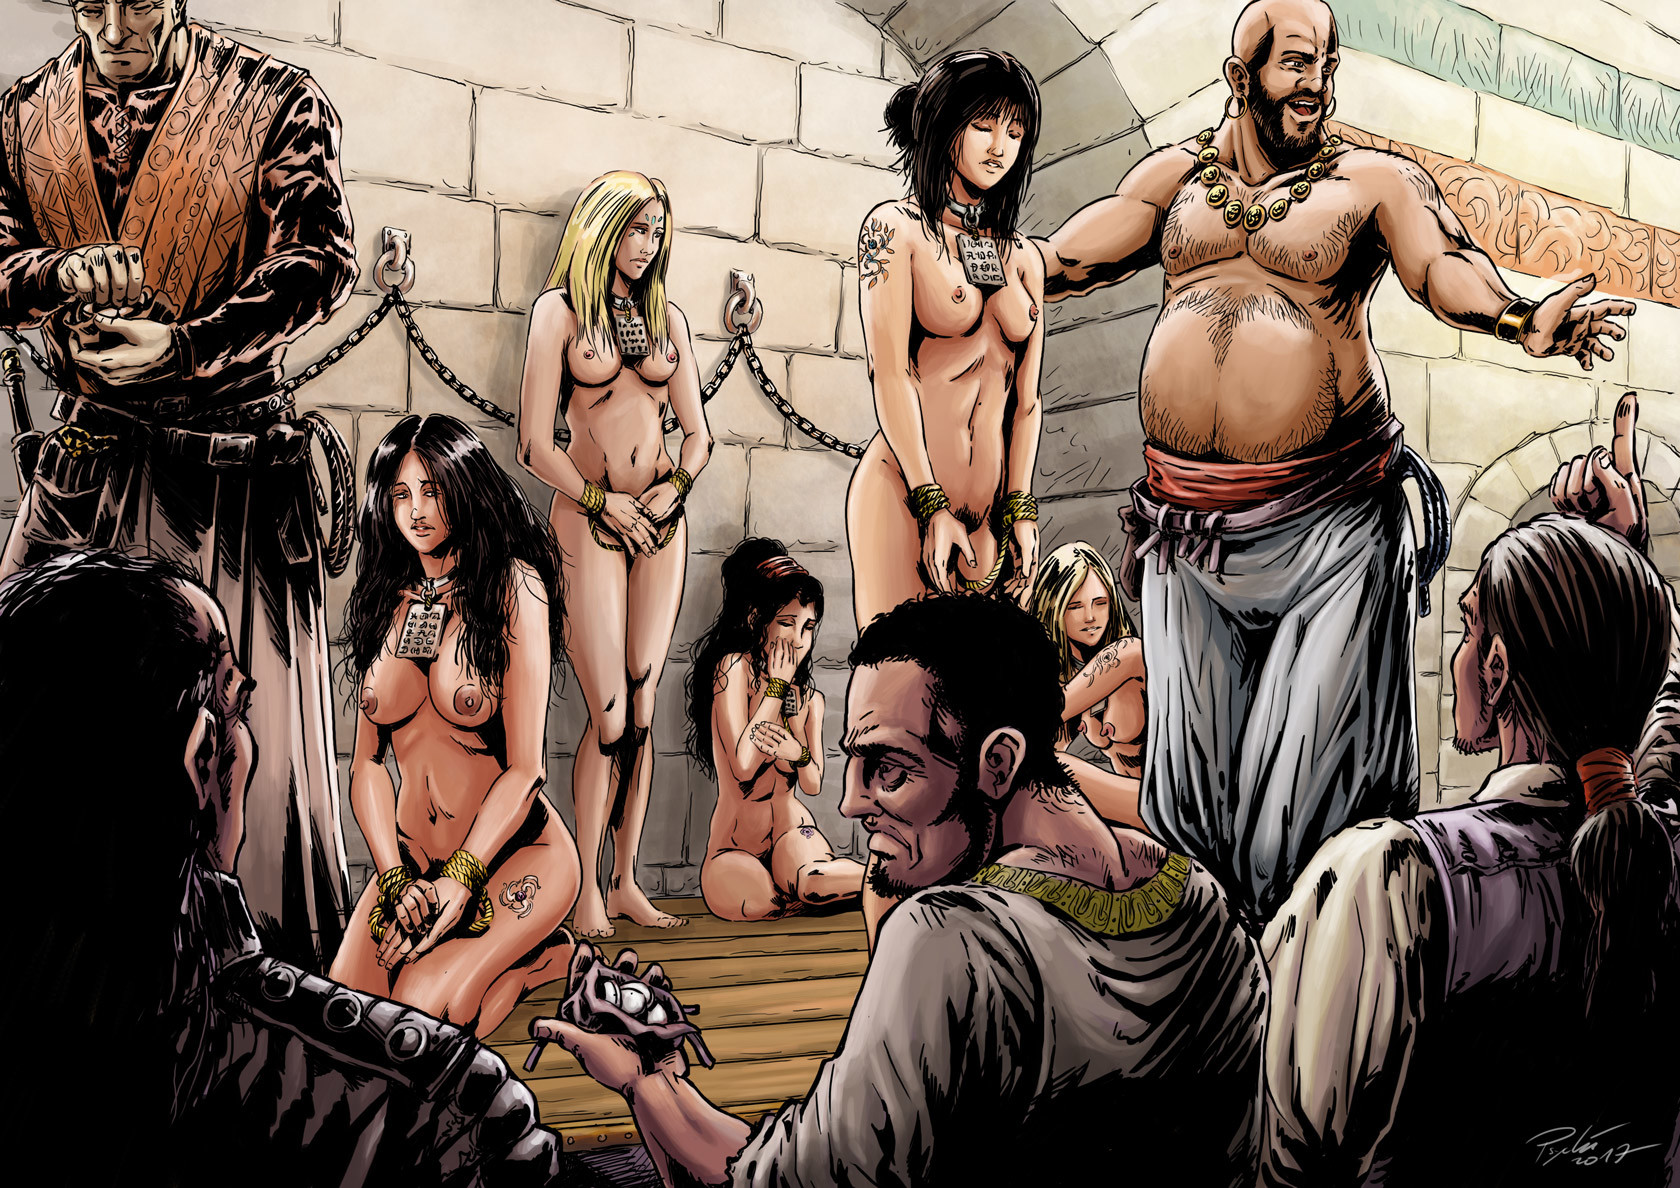 Bdsm female slaves auction